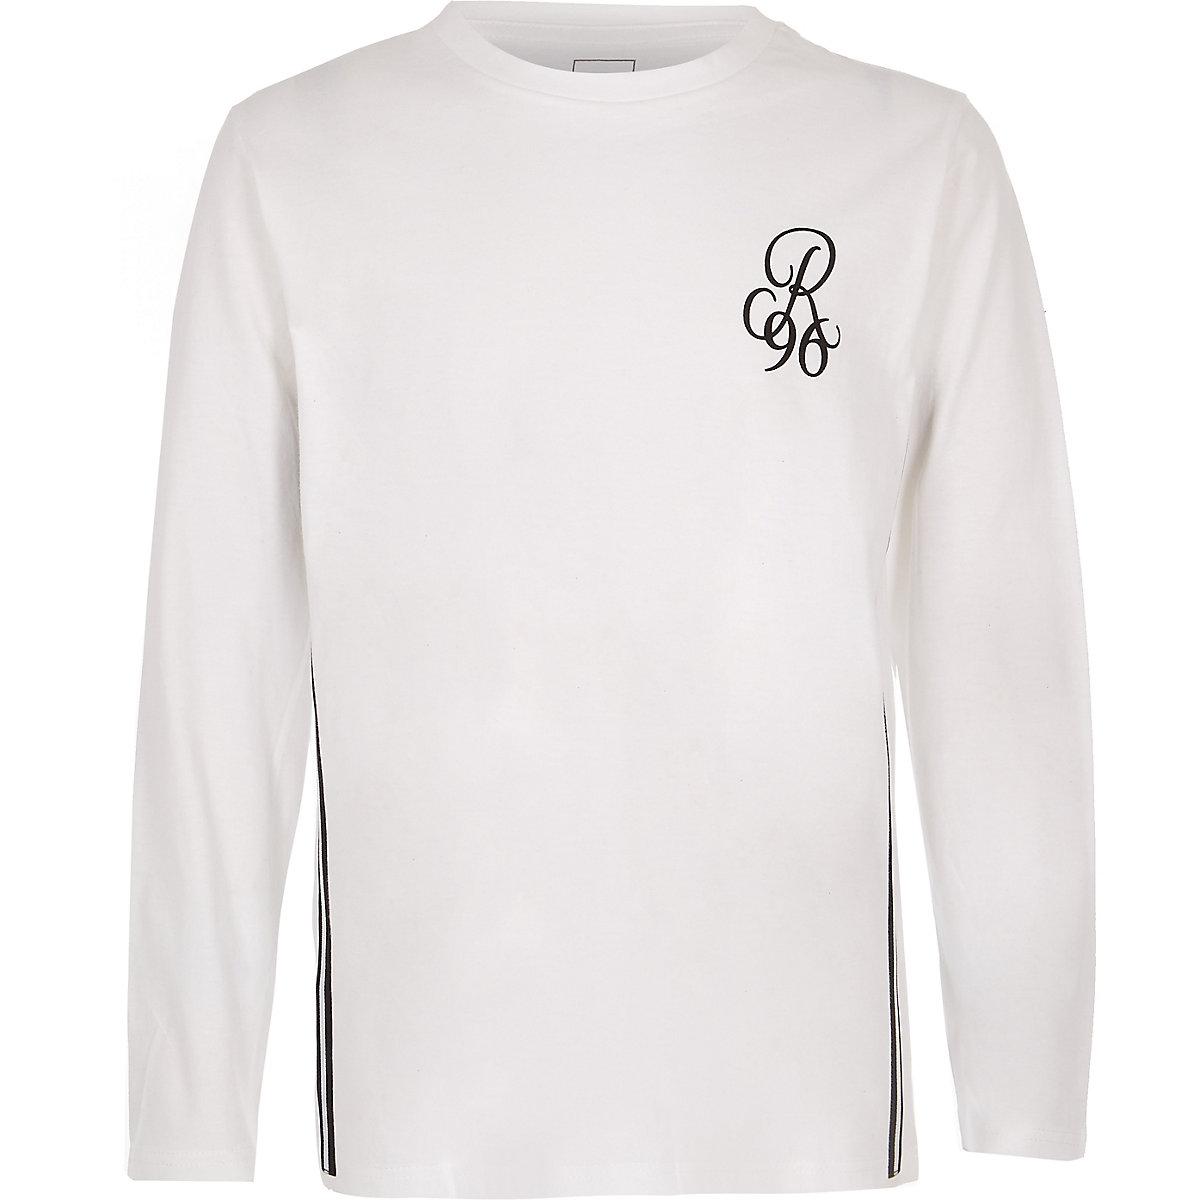 Boys white R96 long sleeve T-shirt